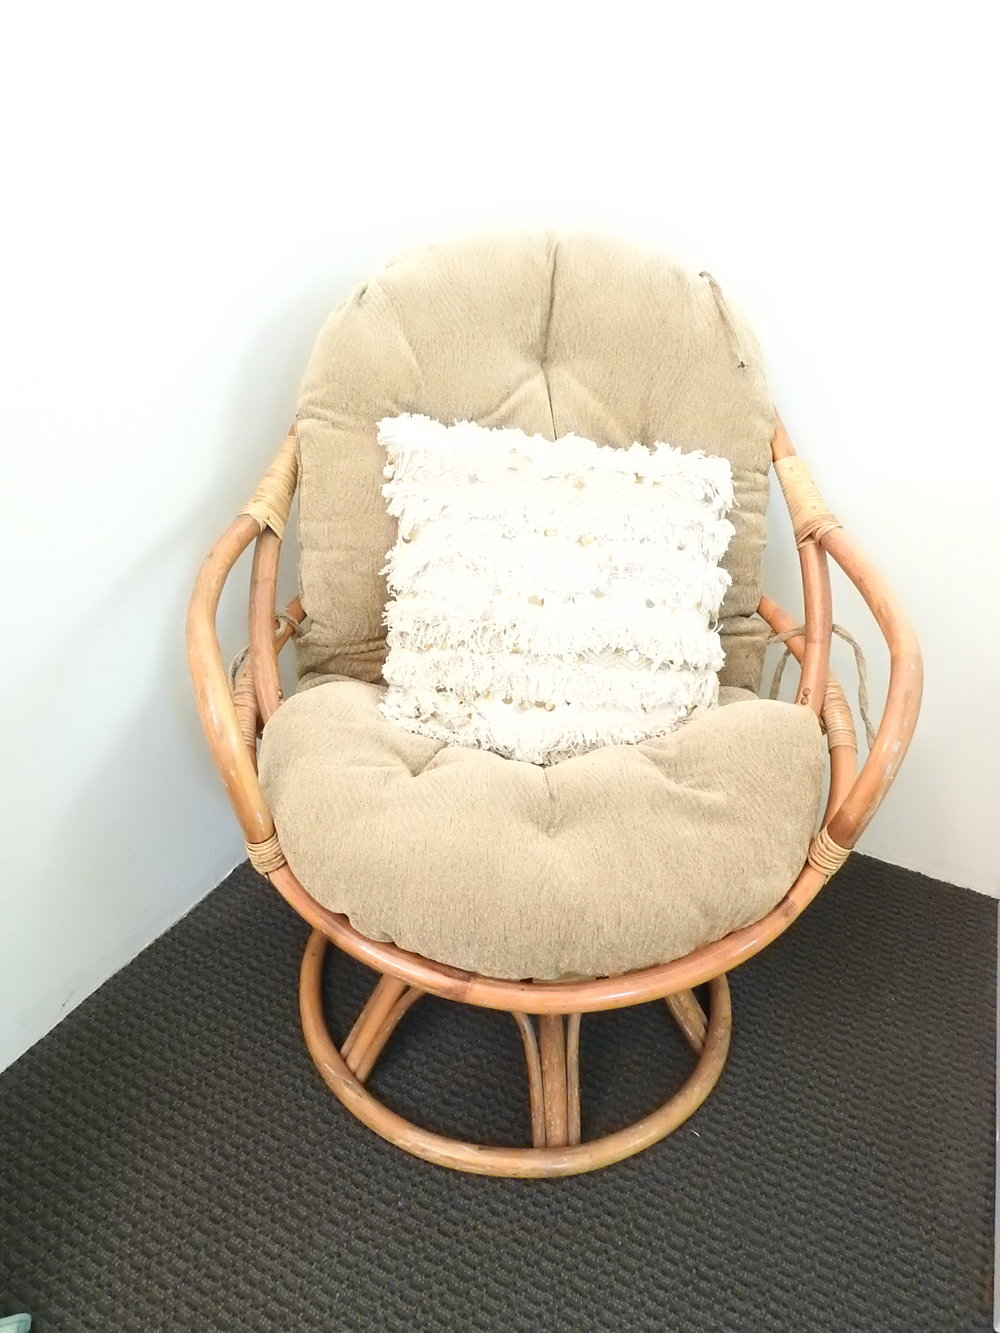 Vintage Rattan Swivel Chair - (1)